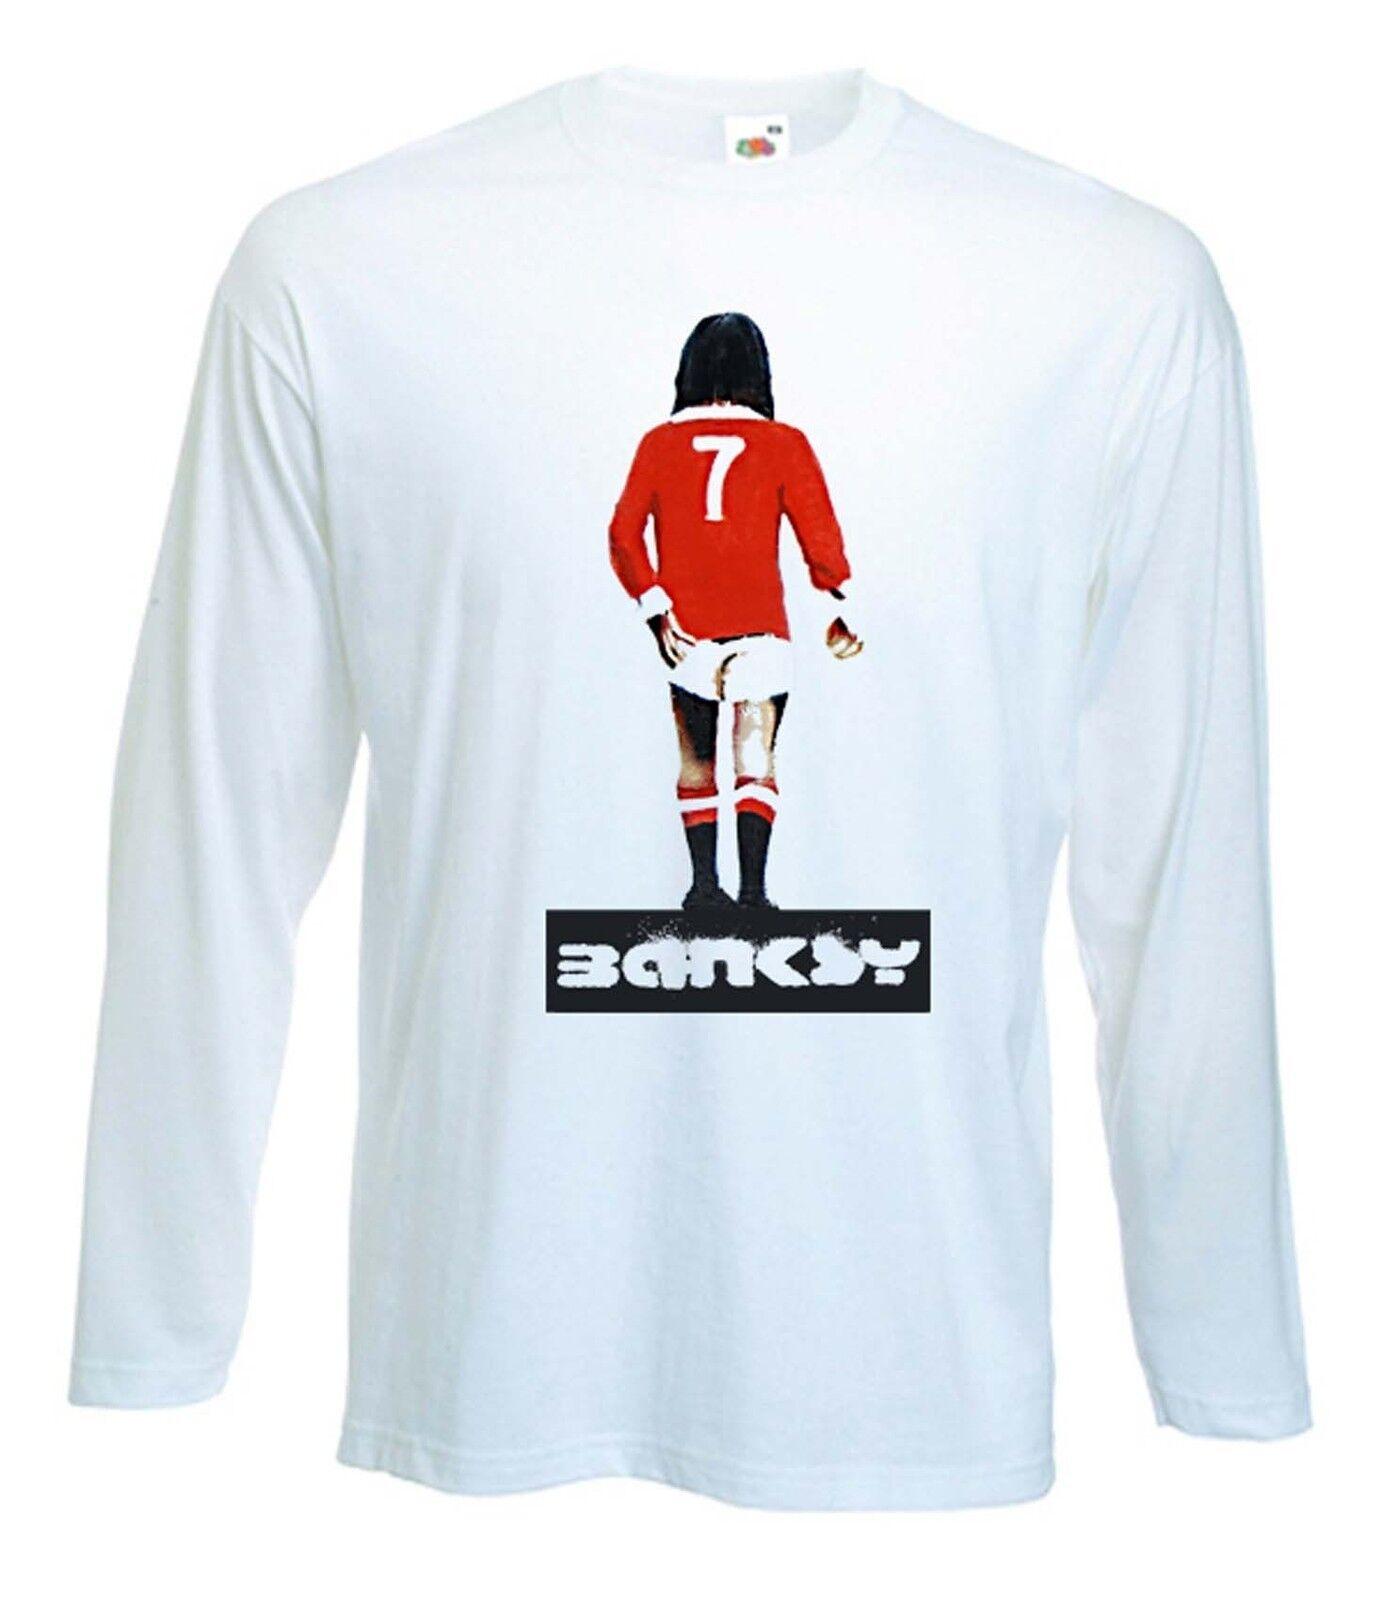 Banksy Girl and Boy Relationship Mean T-shirt Vest Tank Top Men Women Unisex M95